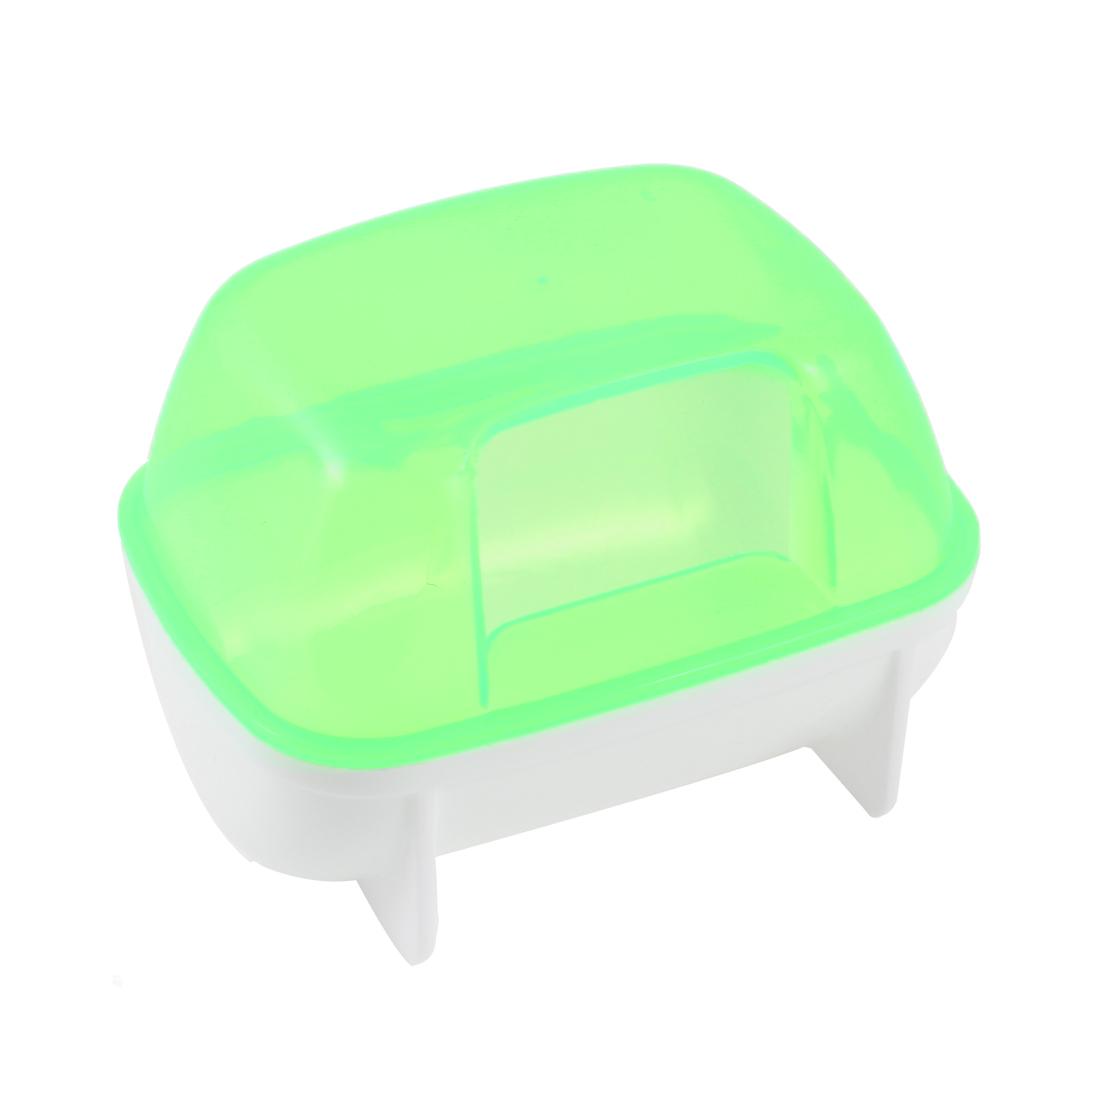 Plastic Small Animal Sand Room Pet Hamster Bathing Bathroom Green White 10x7x7cm